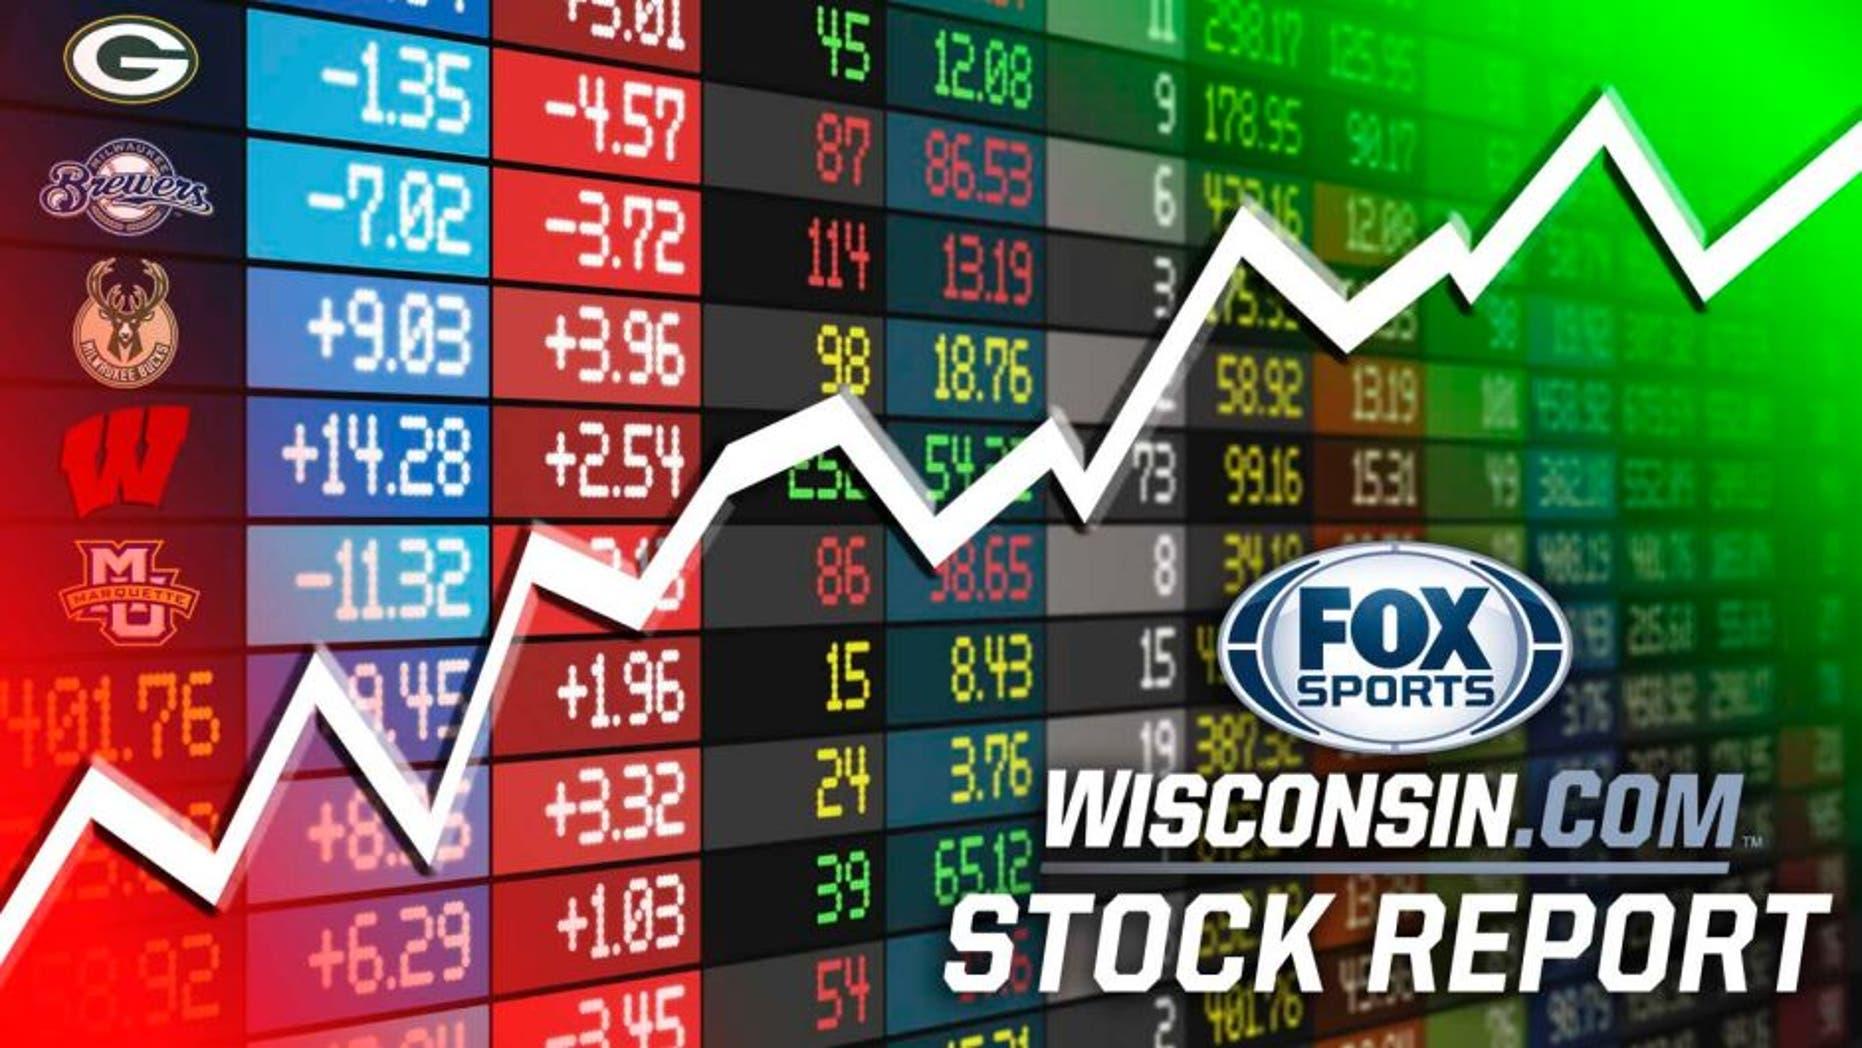 Stock exchange market business concept